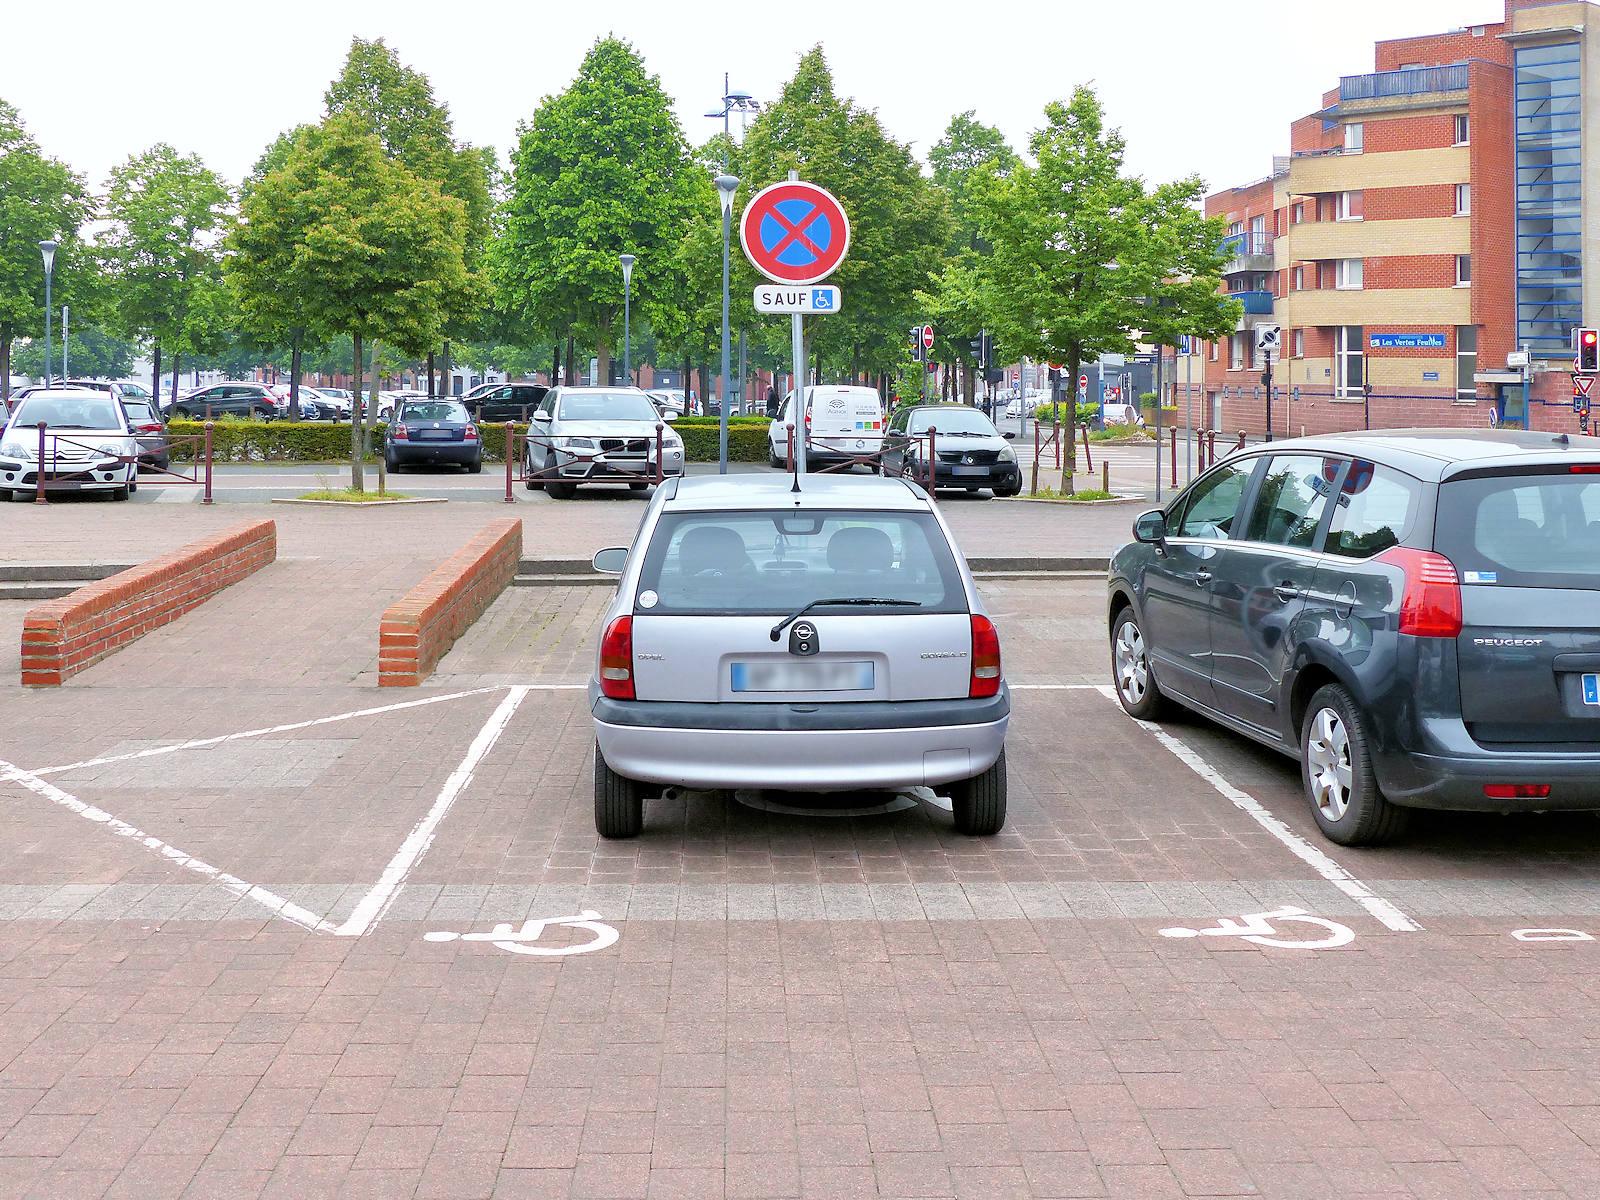 Parking Handicapés - Place Miss Cavell, Tourcoing